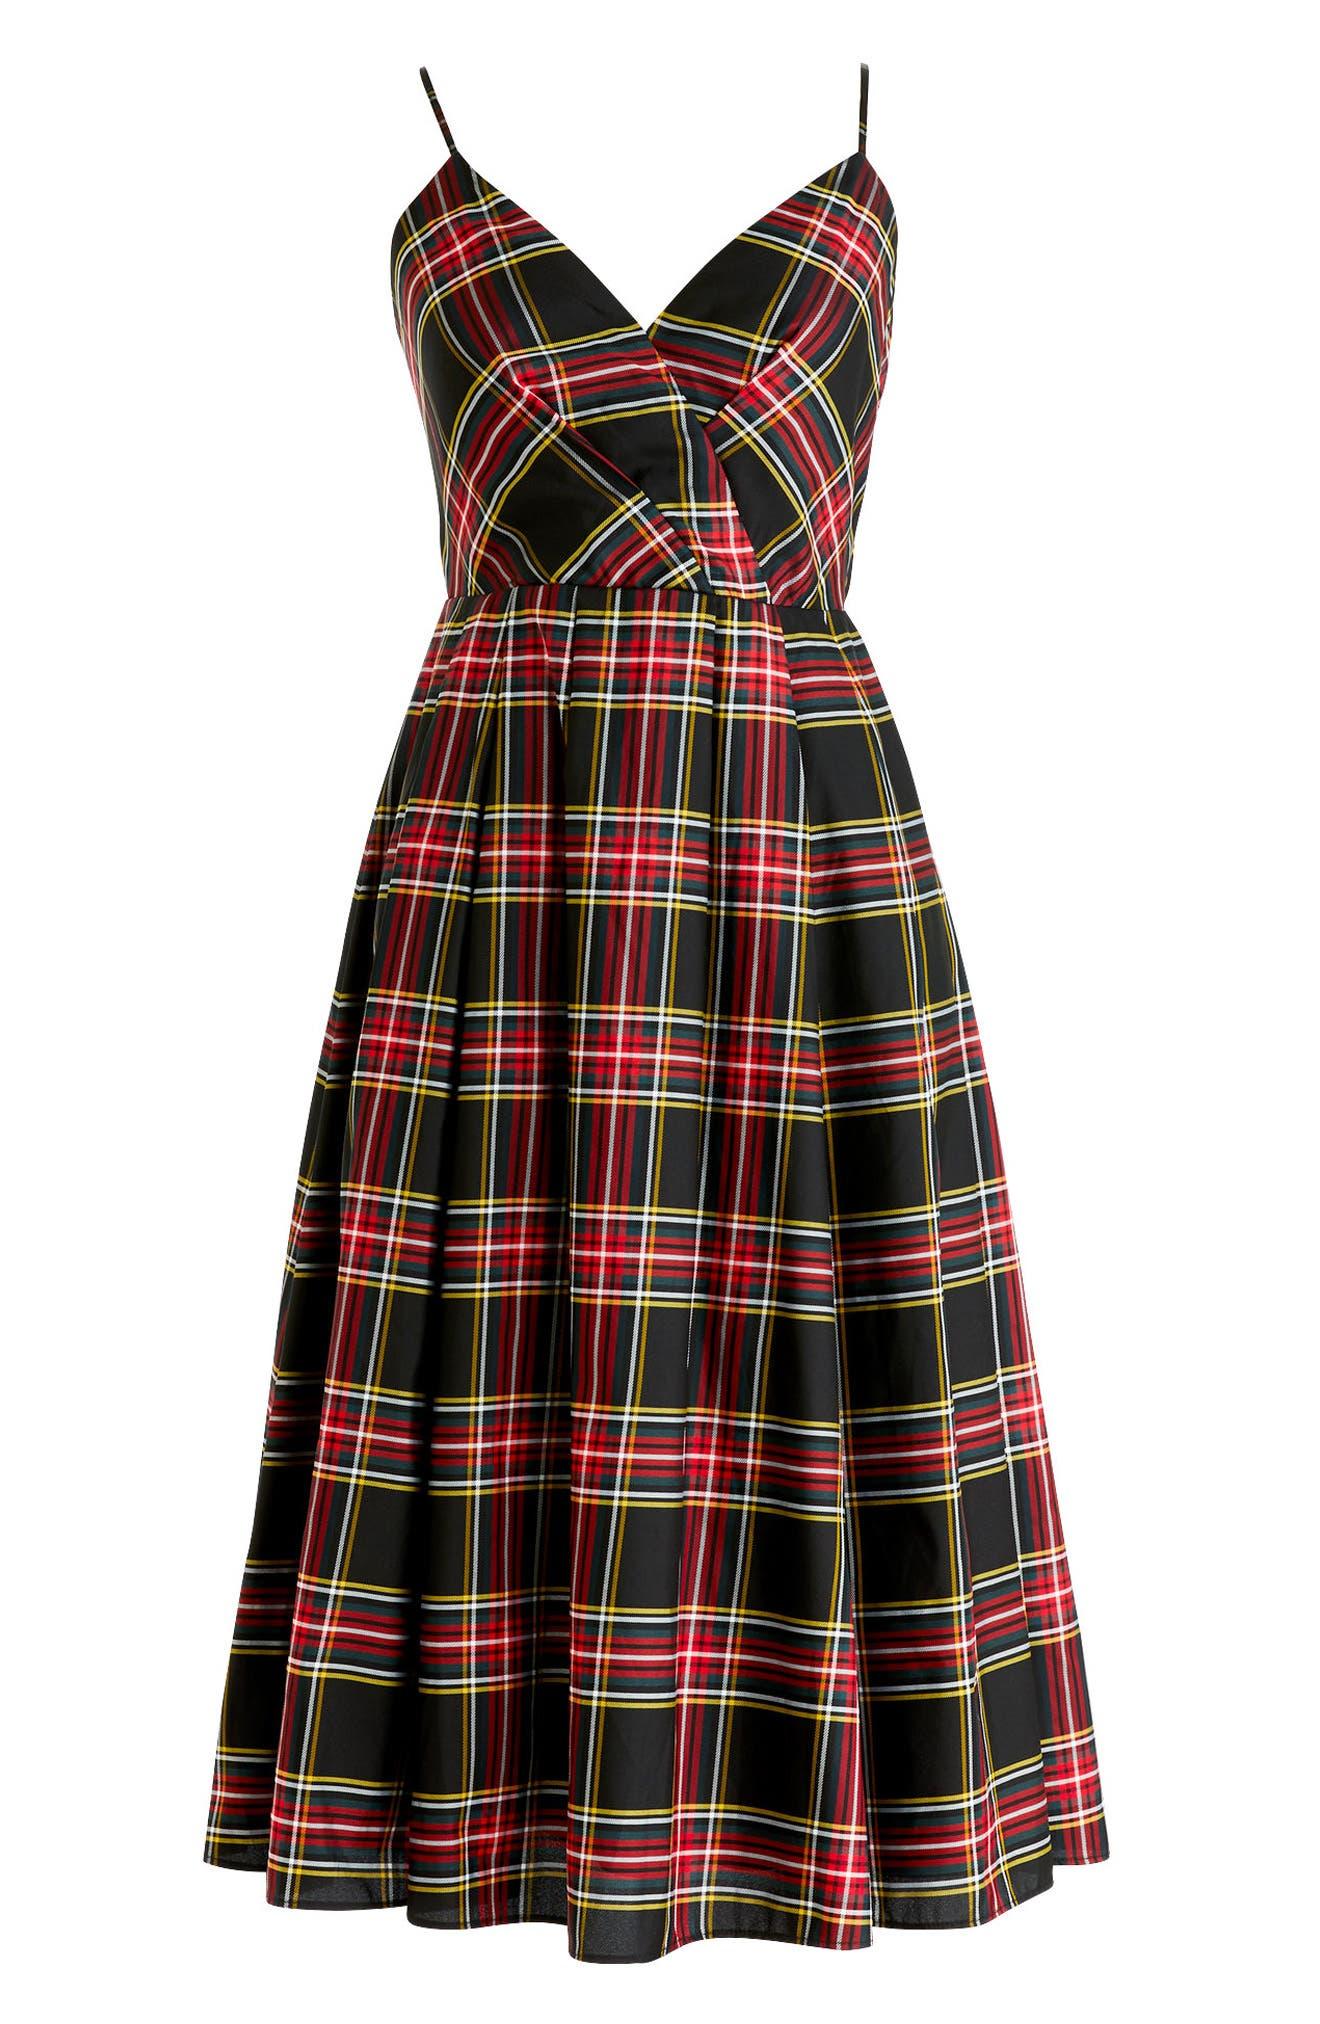 Spaghetti Strap Stewart Plaid A-Line Dress,                             Alternate thumbnail 4, color,                             Red Green Tartan